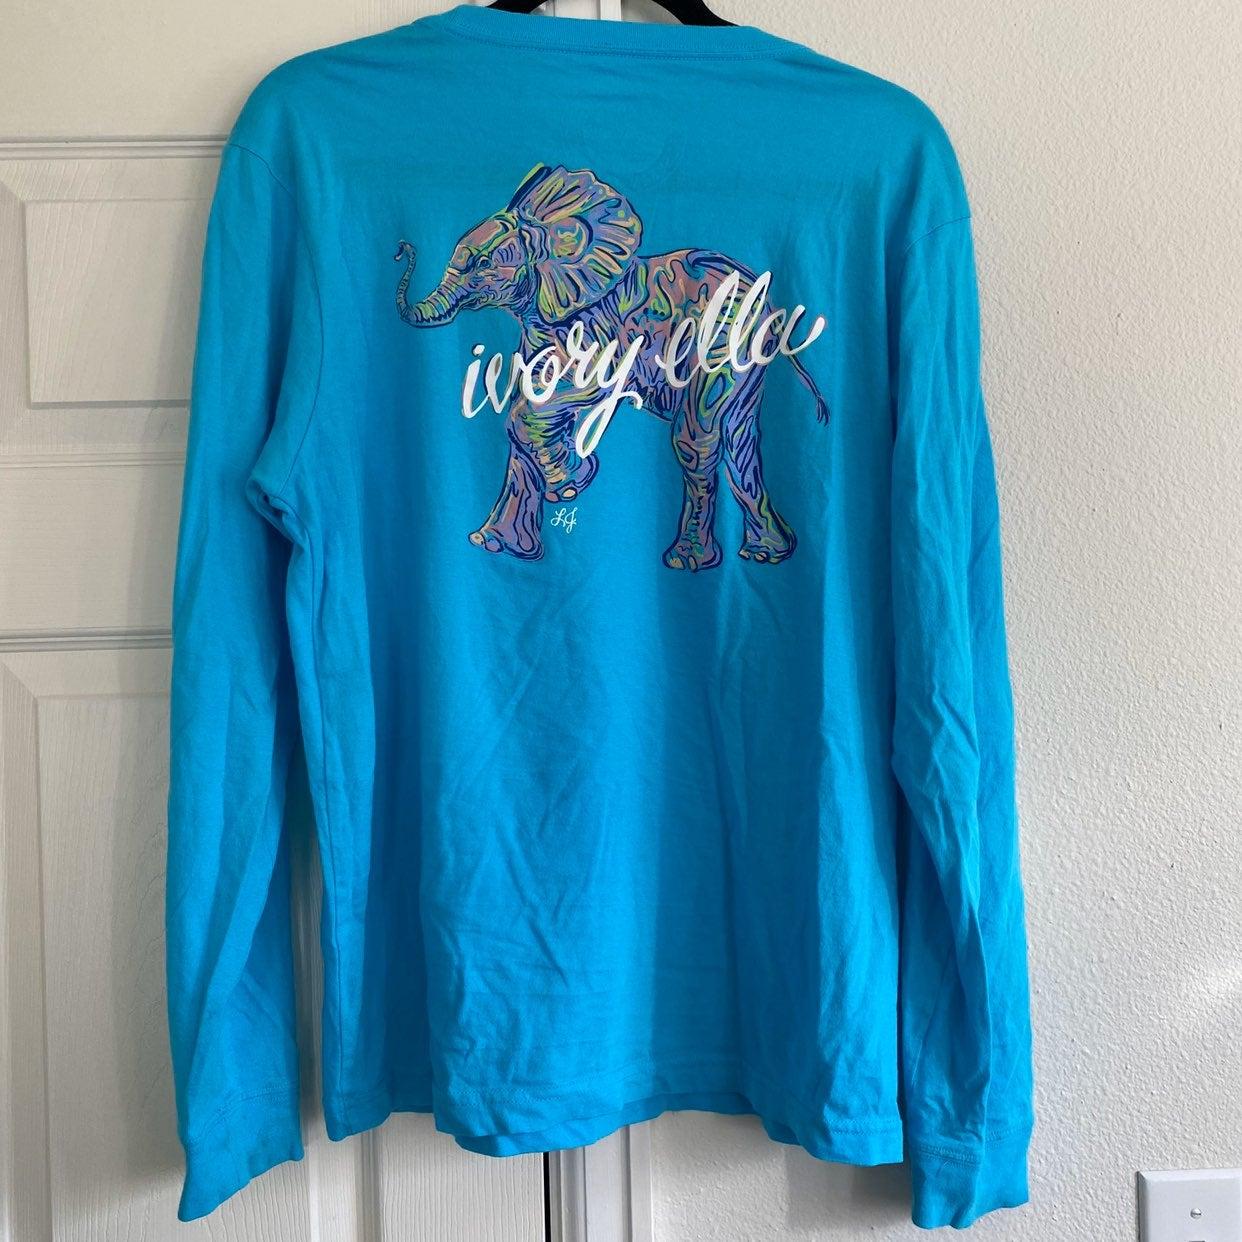 Ivory Ella blue long sleeve top